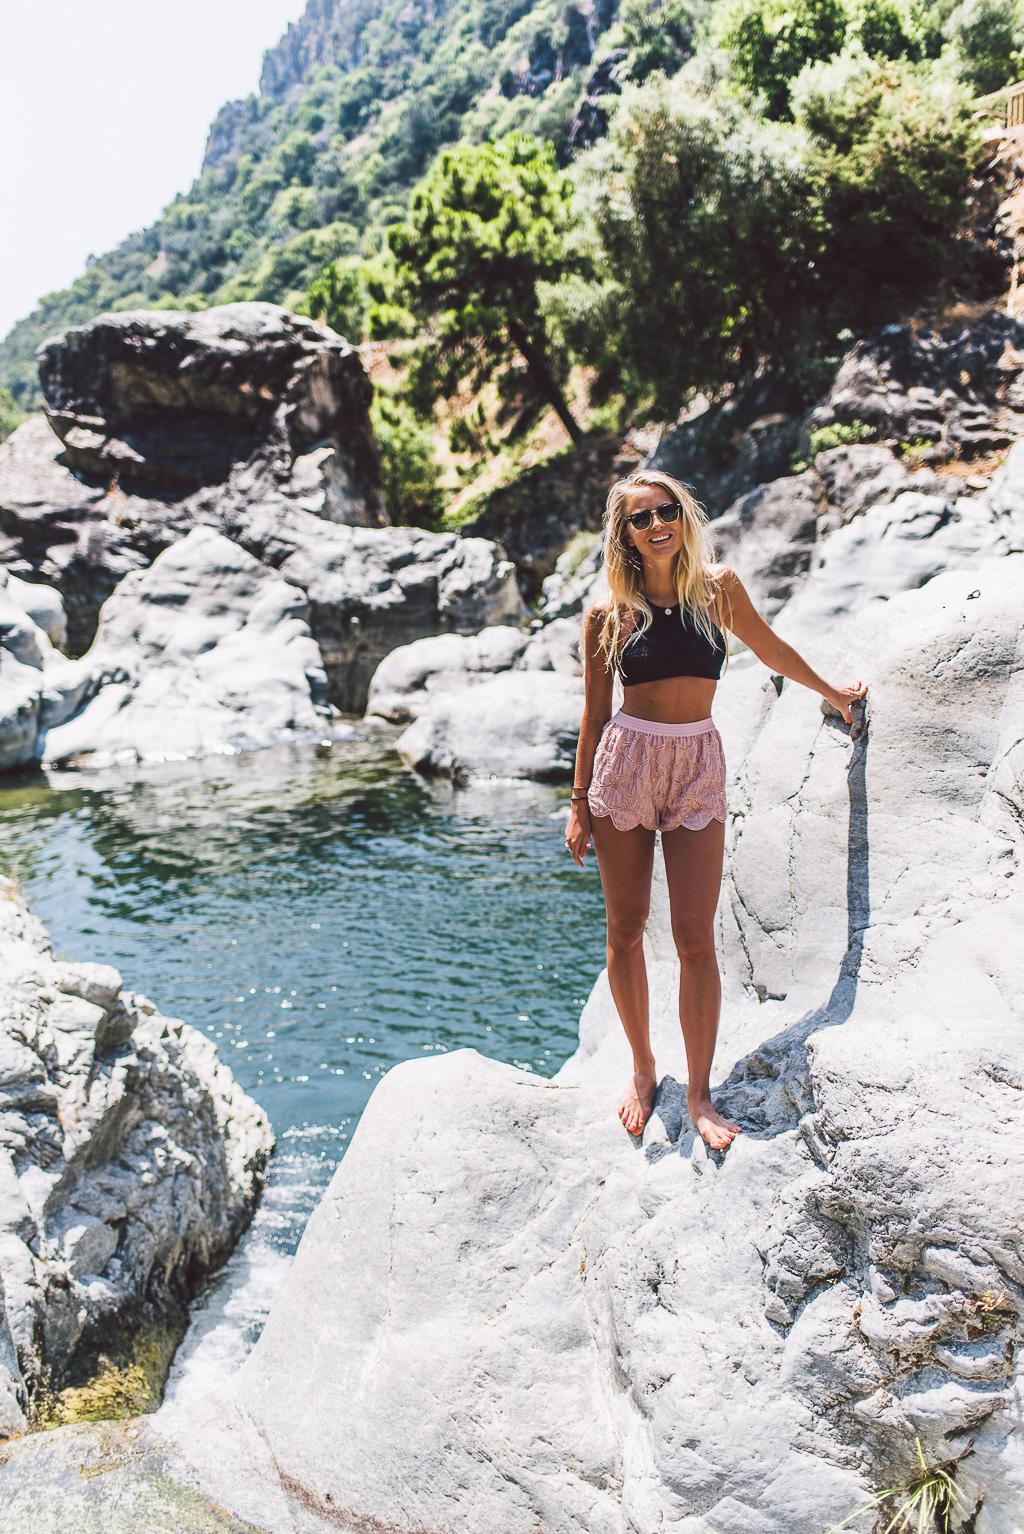 janni-deler-cliff-jumpingDSC_7960